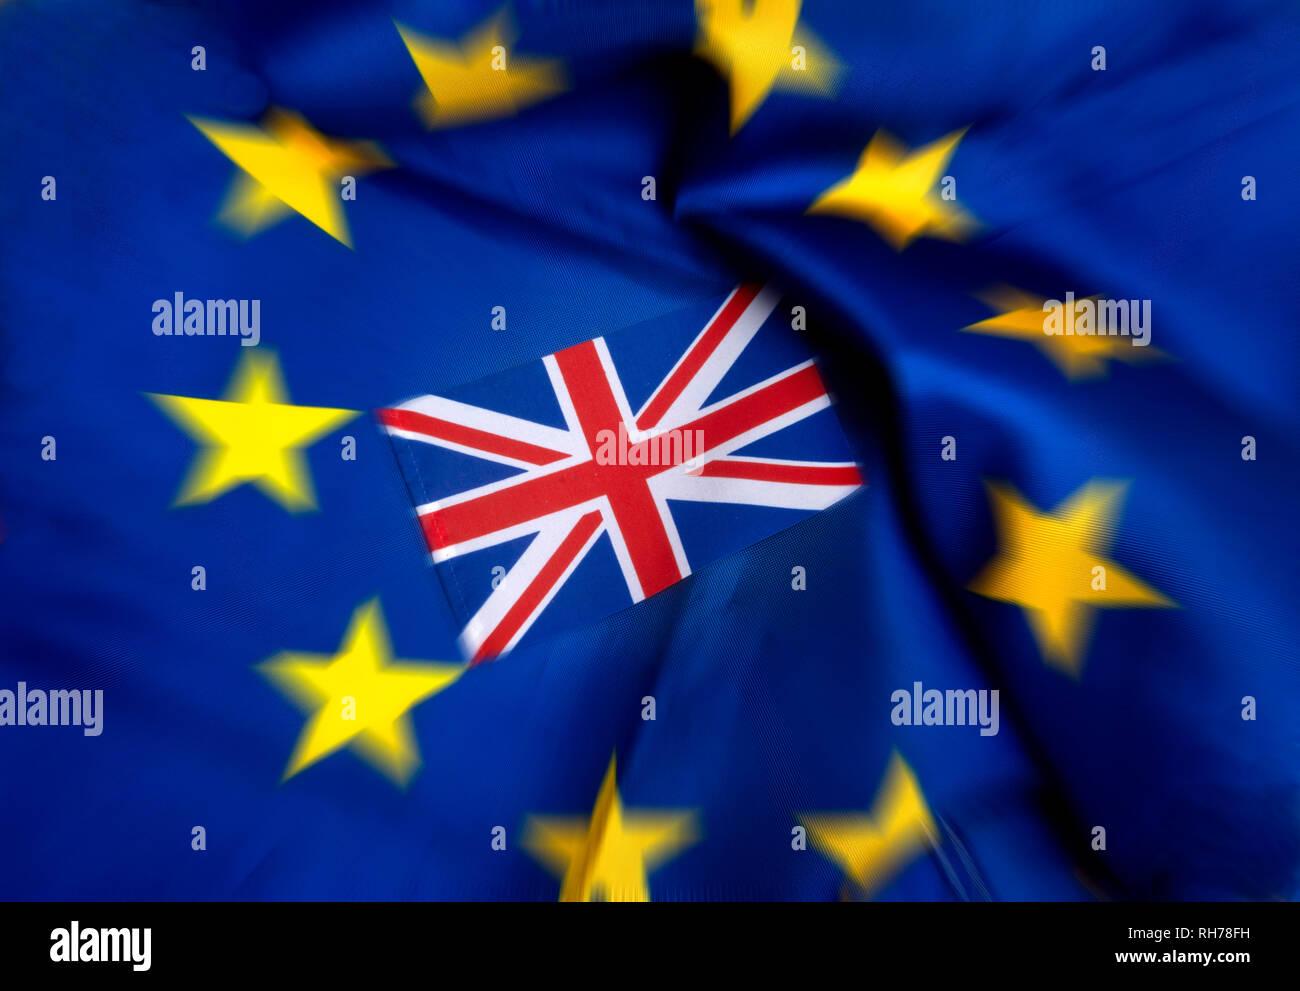 Flags of European Union and United Kingdom - Stock Image